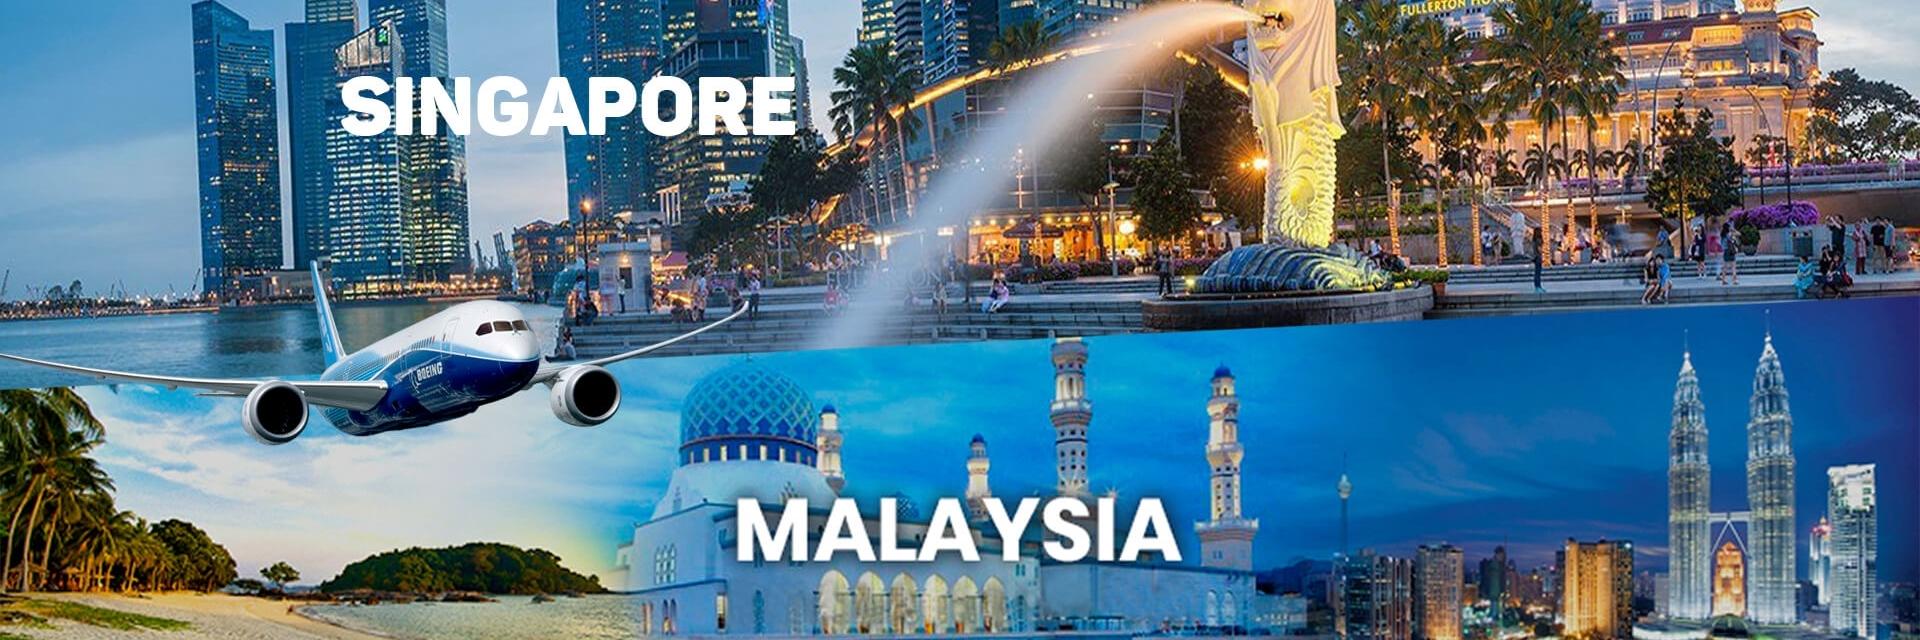 https://gody.vn/blog/kmsl3728/post/du-lich-singapore-malaysia-5n4d-tu-tuc-hanh-trinh-trai-nghiem-2-diem-den-5350